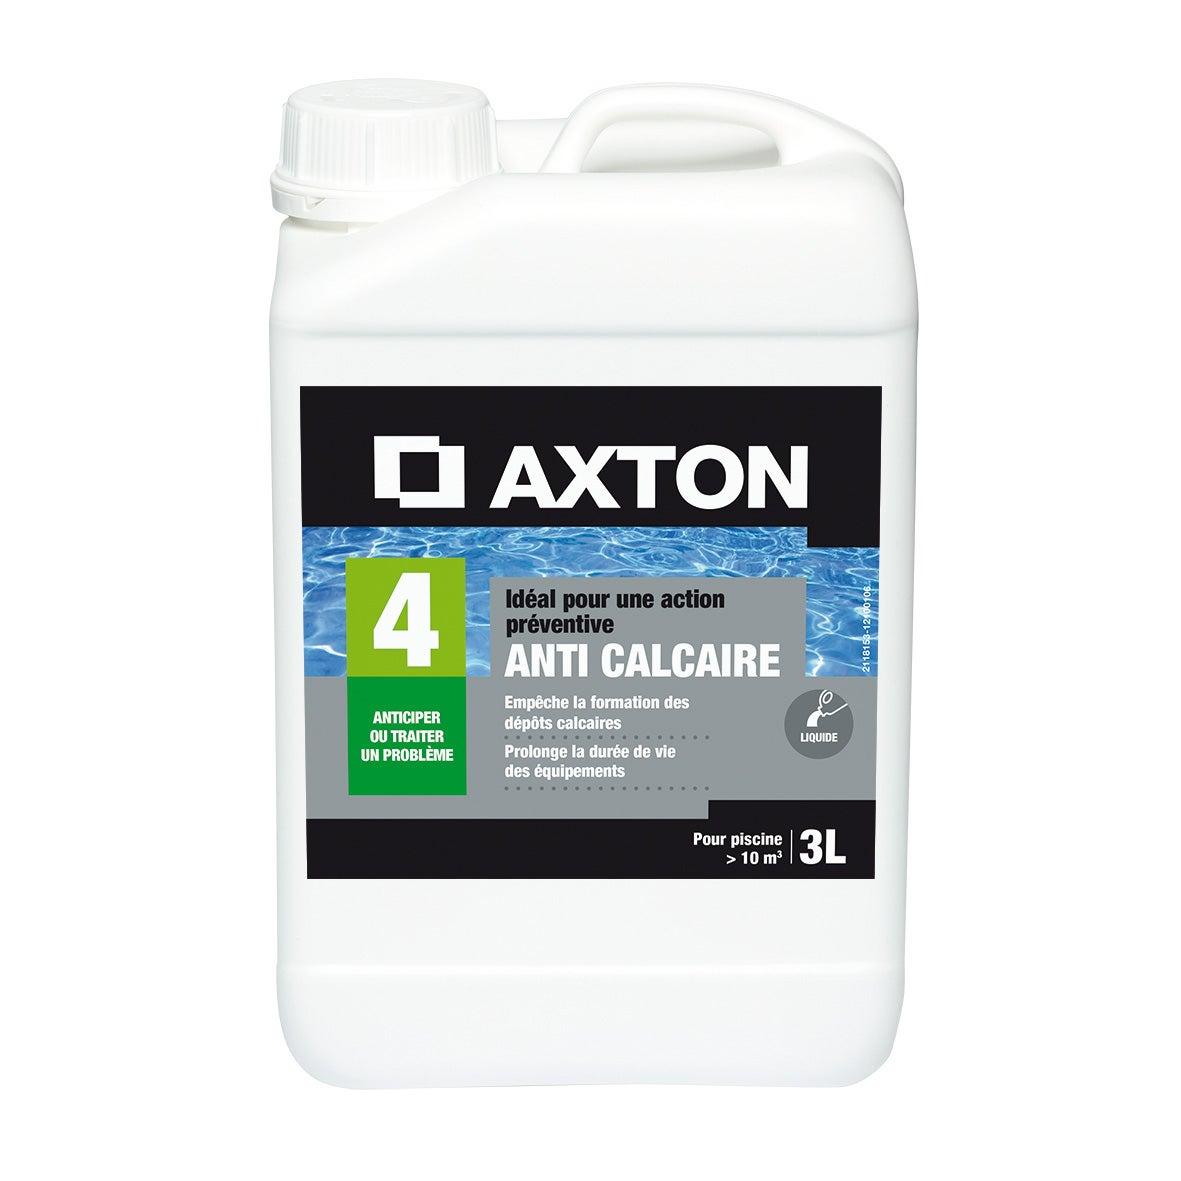 Anticalcaire Piscine Axton, Liquide 3 L concernant Produit Anti Calcaire Piscine